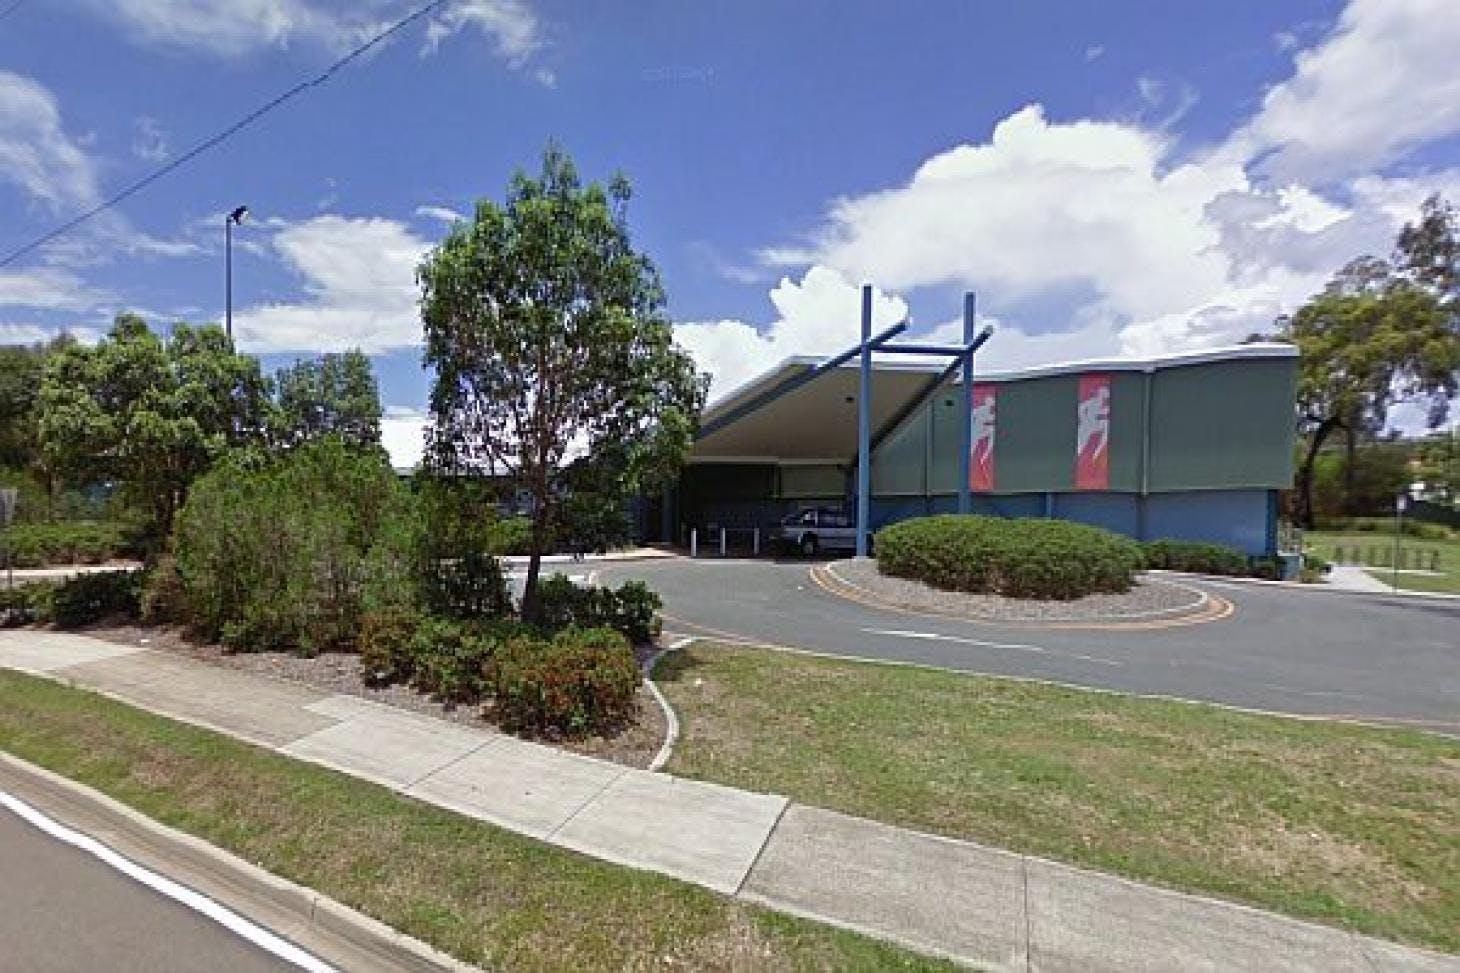 The Warren Sports Centre Outdoor | Astroturf hockey pitch